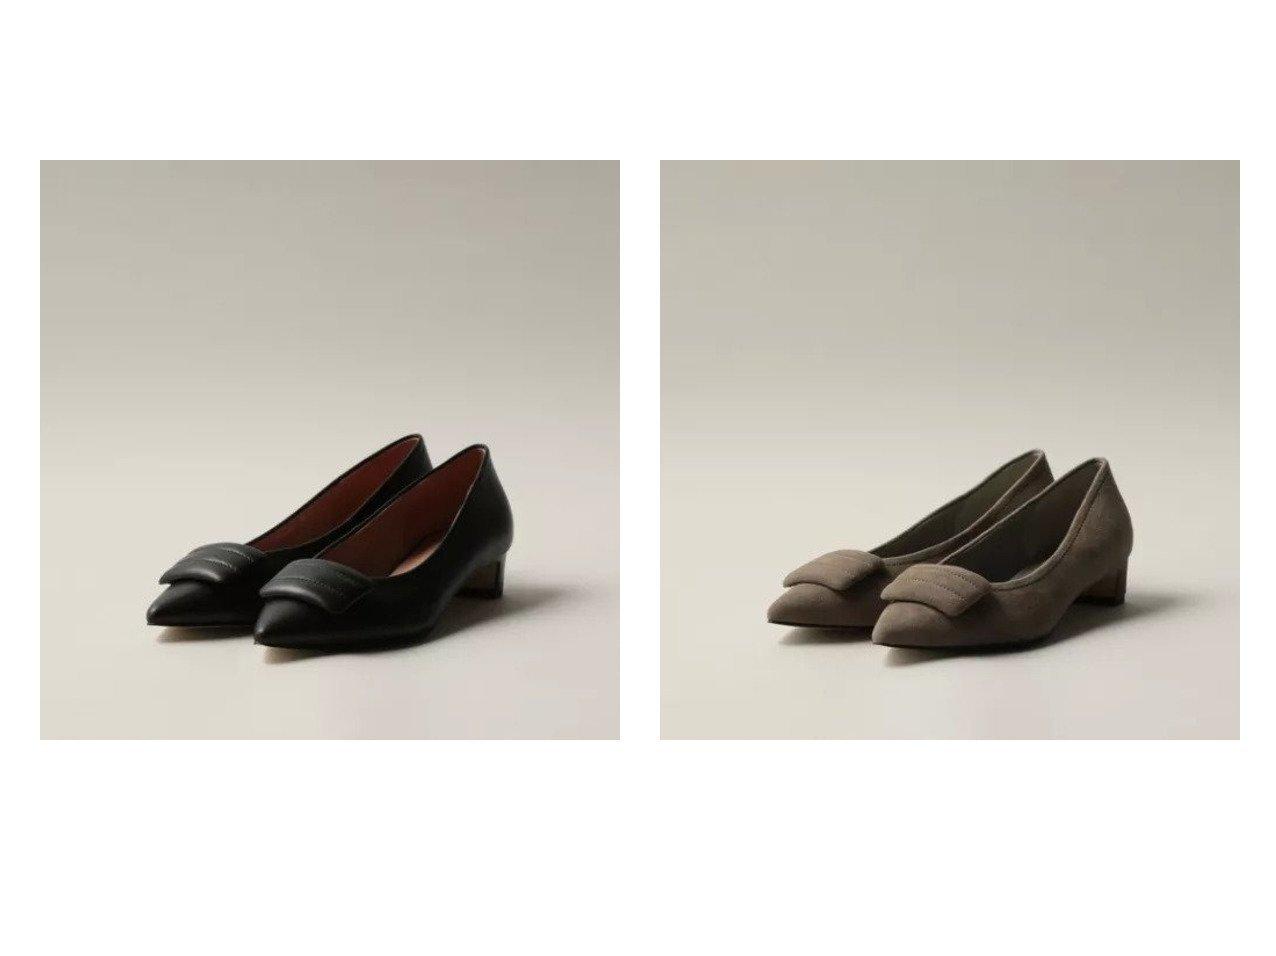 【Odette e Odile/オデット エ オディール】のパデットモチーフ パンプス30↓↑ 【シューズ・靴】おすすめ!人気、トレンド・レディースファッションの通販 おすすめで人気の流行・トレンド、ファッションの通販商品 インテリア・家具・メンズファッション・キッズファッション・レディースファッション・服の通販 founy(ファニー) https://founy.com/ ファッション Fashion レディースファッション WOMEN シューズ スクエア トレンド モチーフ  ID:crp329100000062644